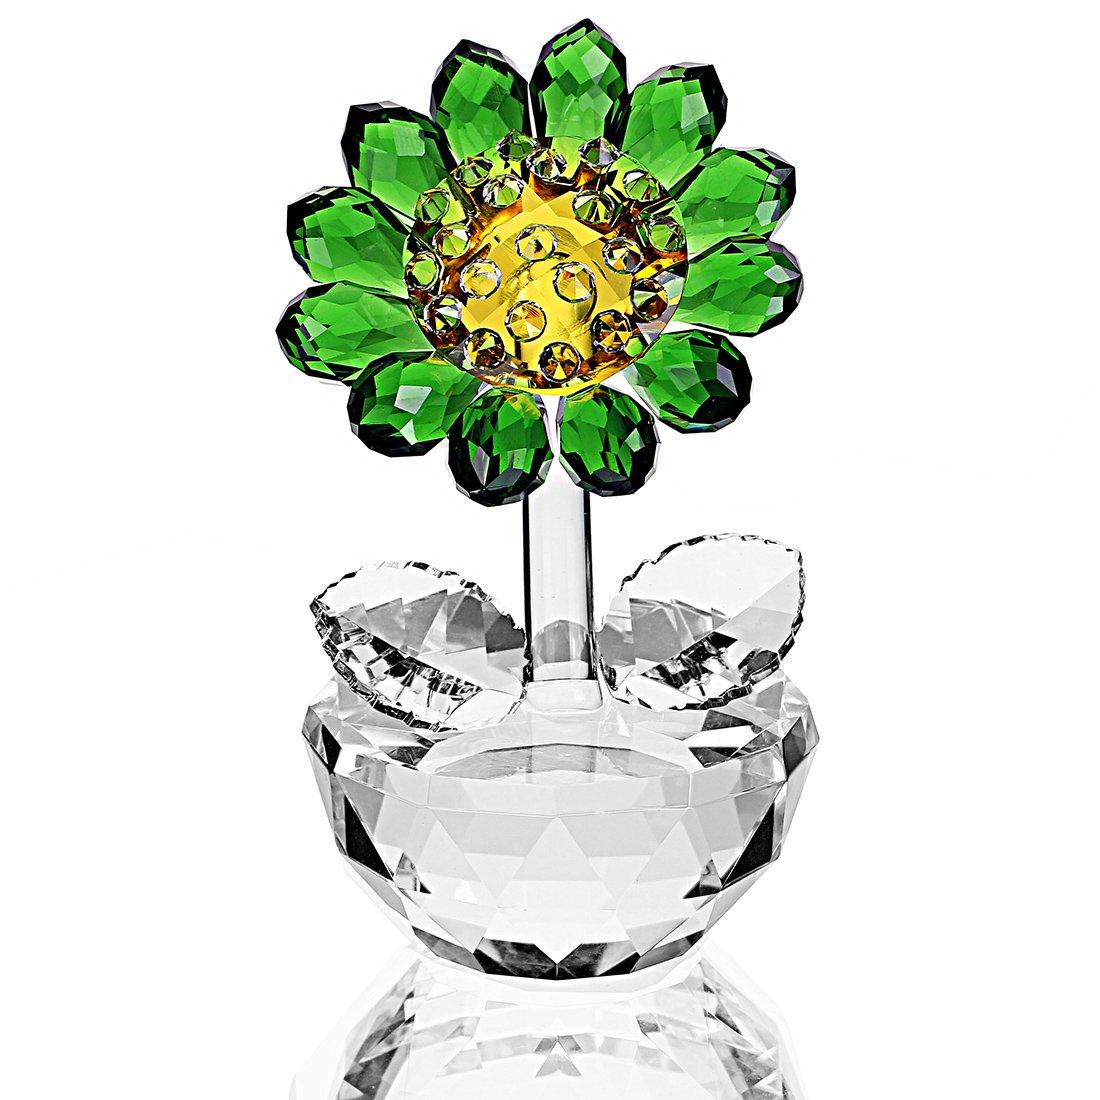 H&D HYALINE & DORA Crystal Sunflower Figurine Ornament Paperweight Home Decor